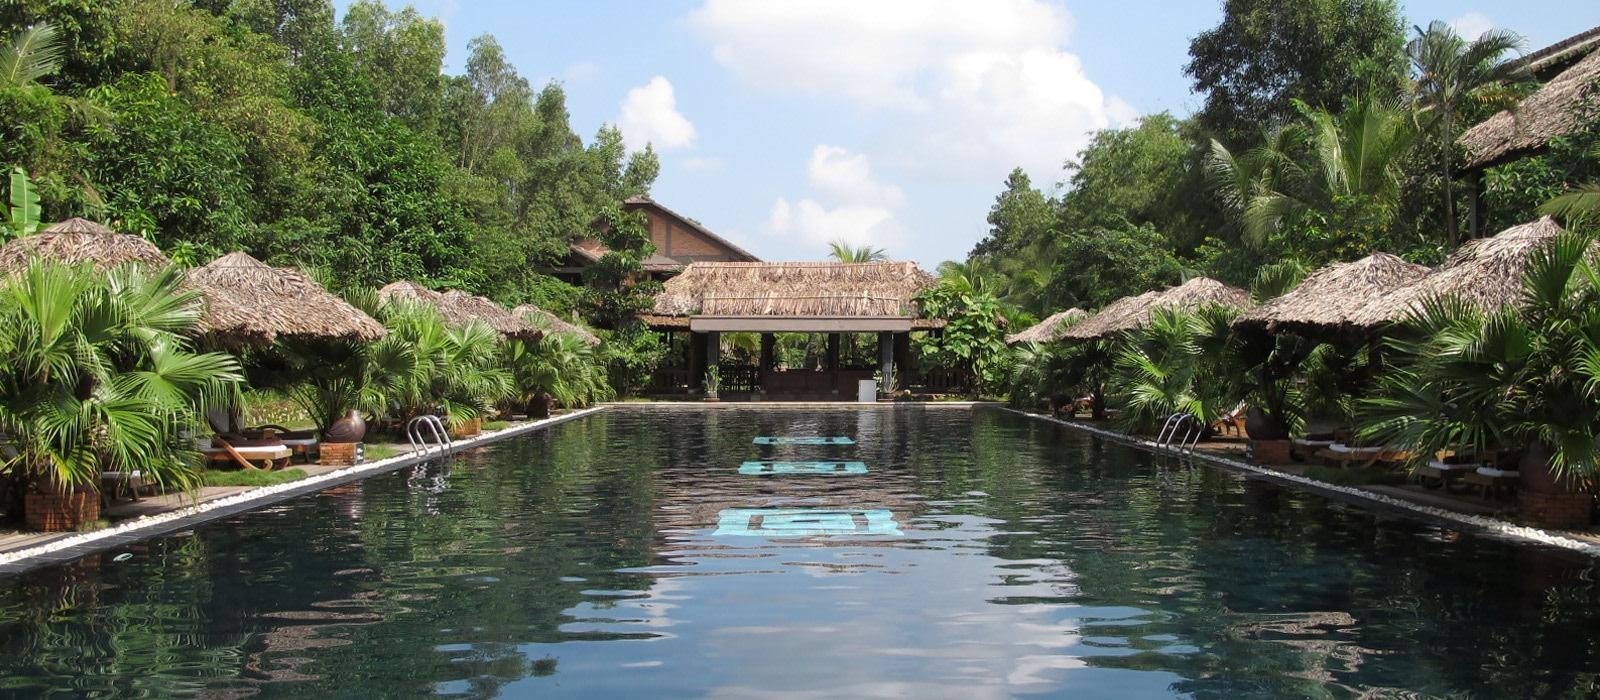 Hotel Pilgrimage Village Vietnam